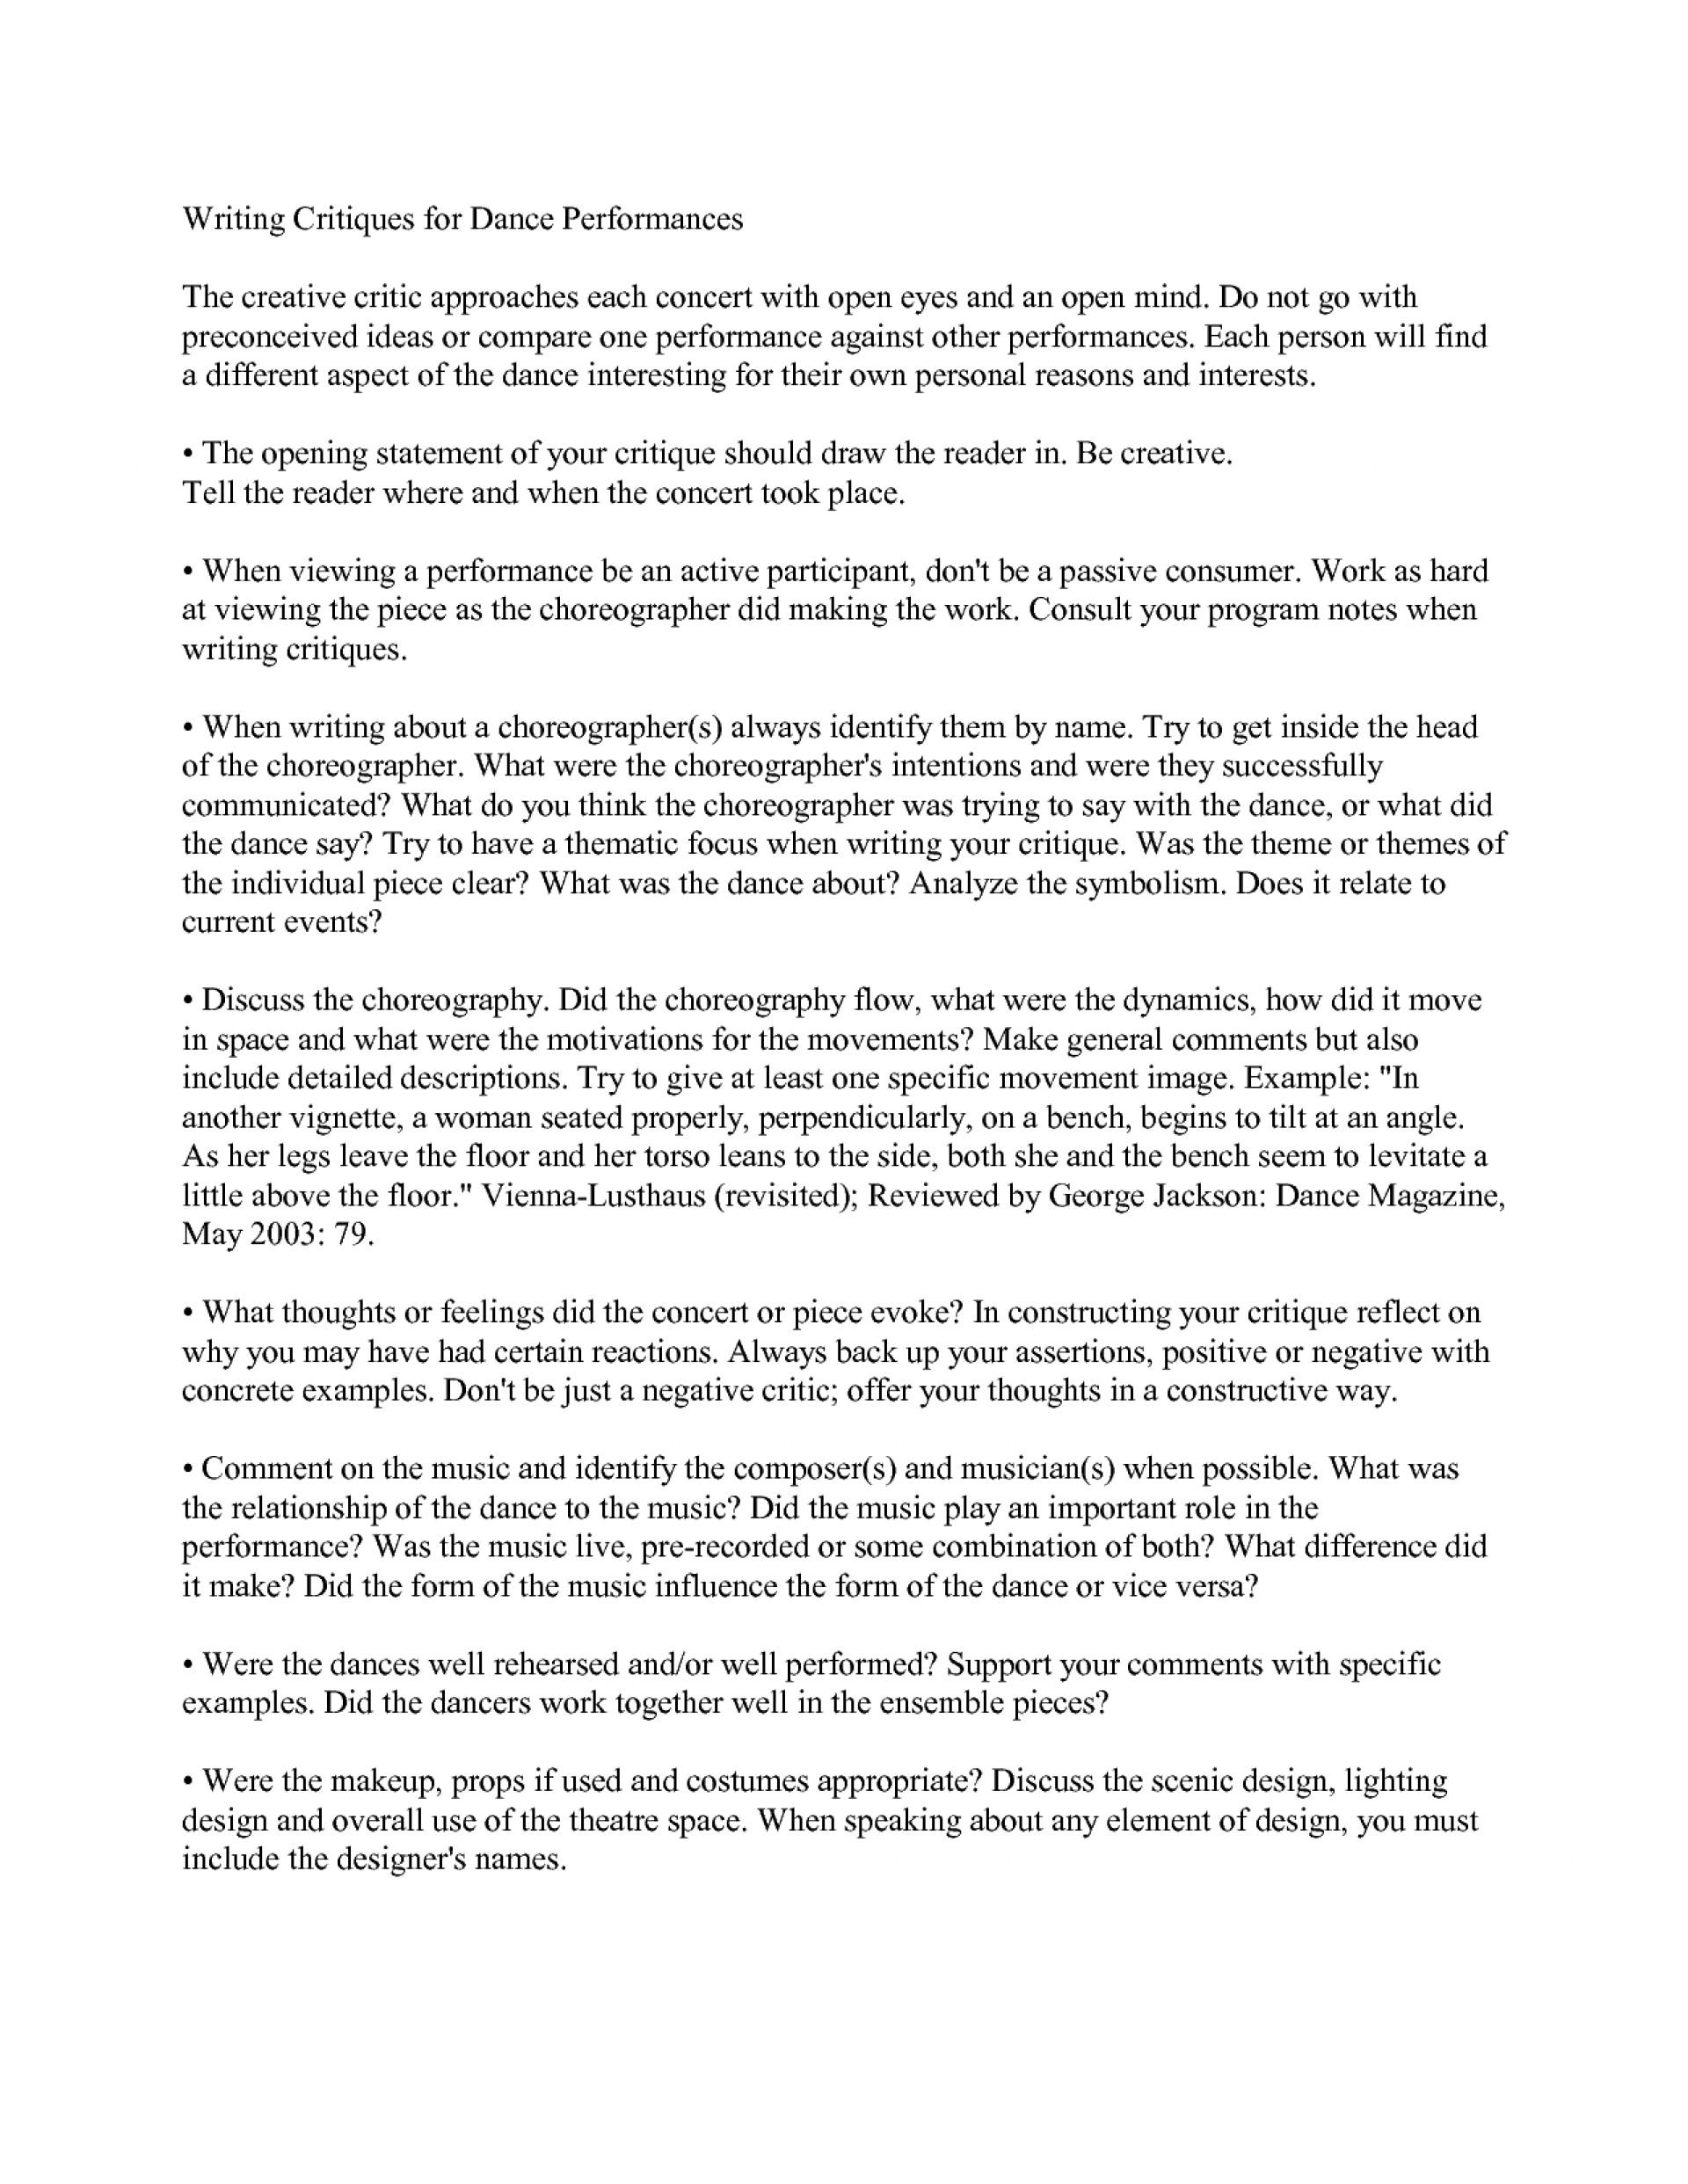 005 Essay Example Dance Essays On Danceconcert Critique Examples L Frightening Jazz Topics Scholarships Conclusion 1920